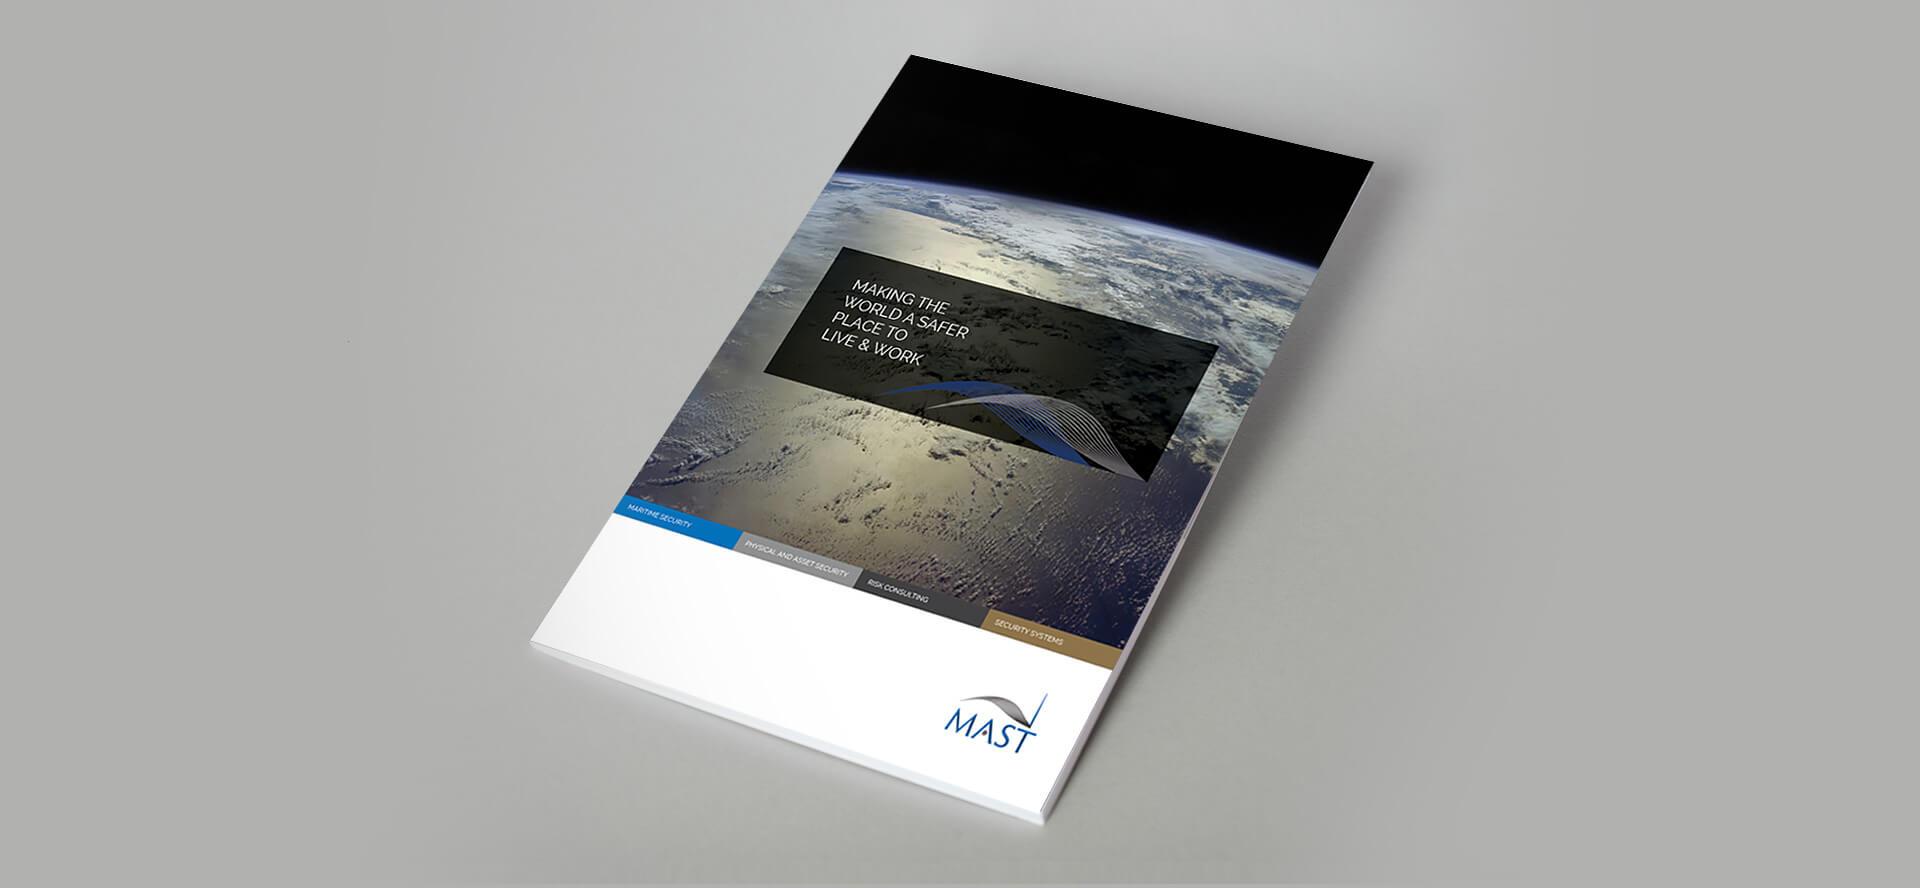 MAST Brochure Design